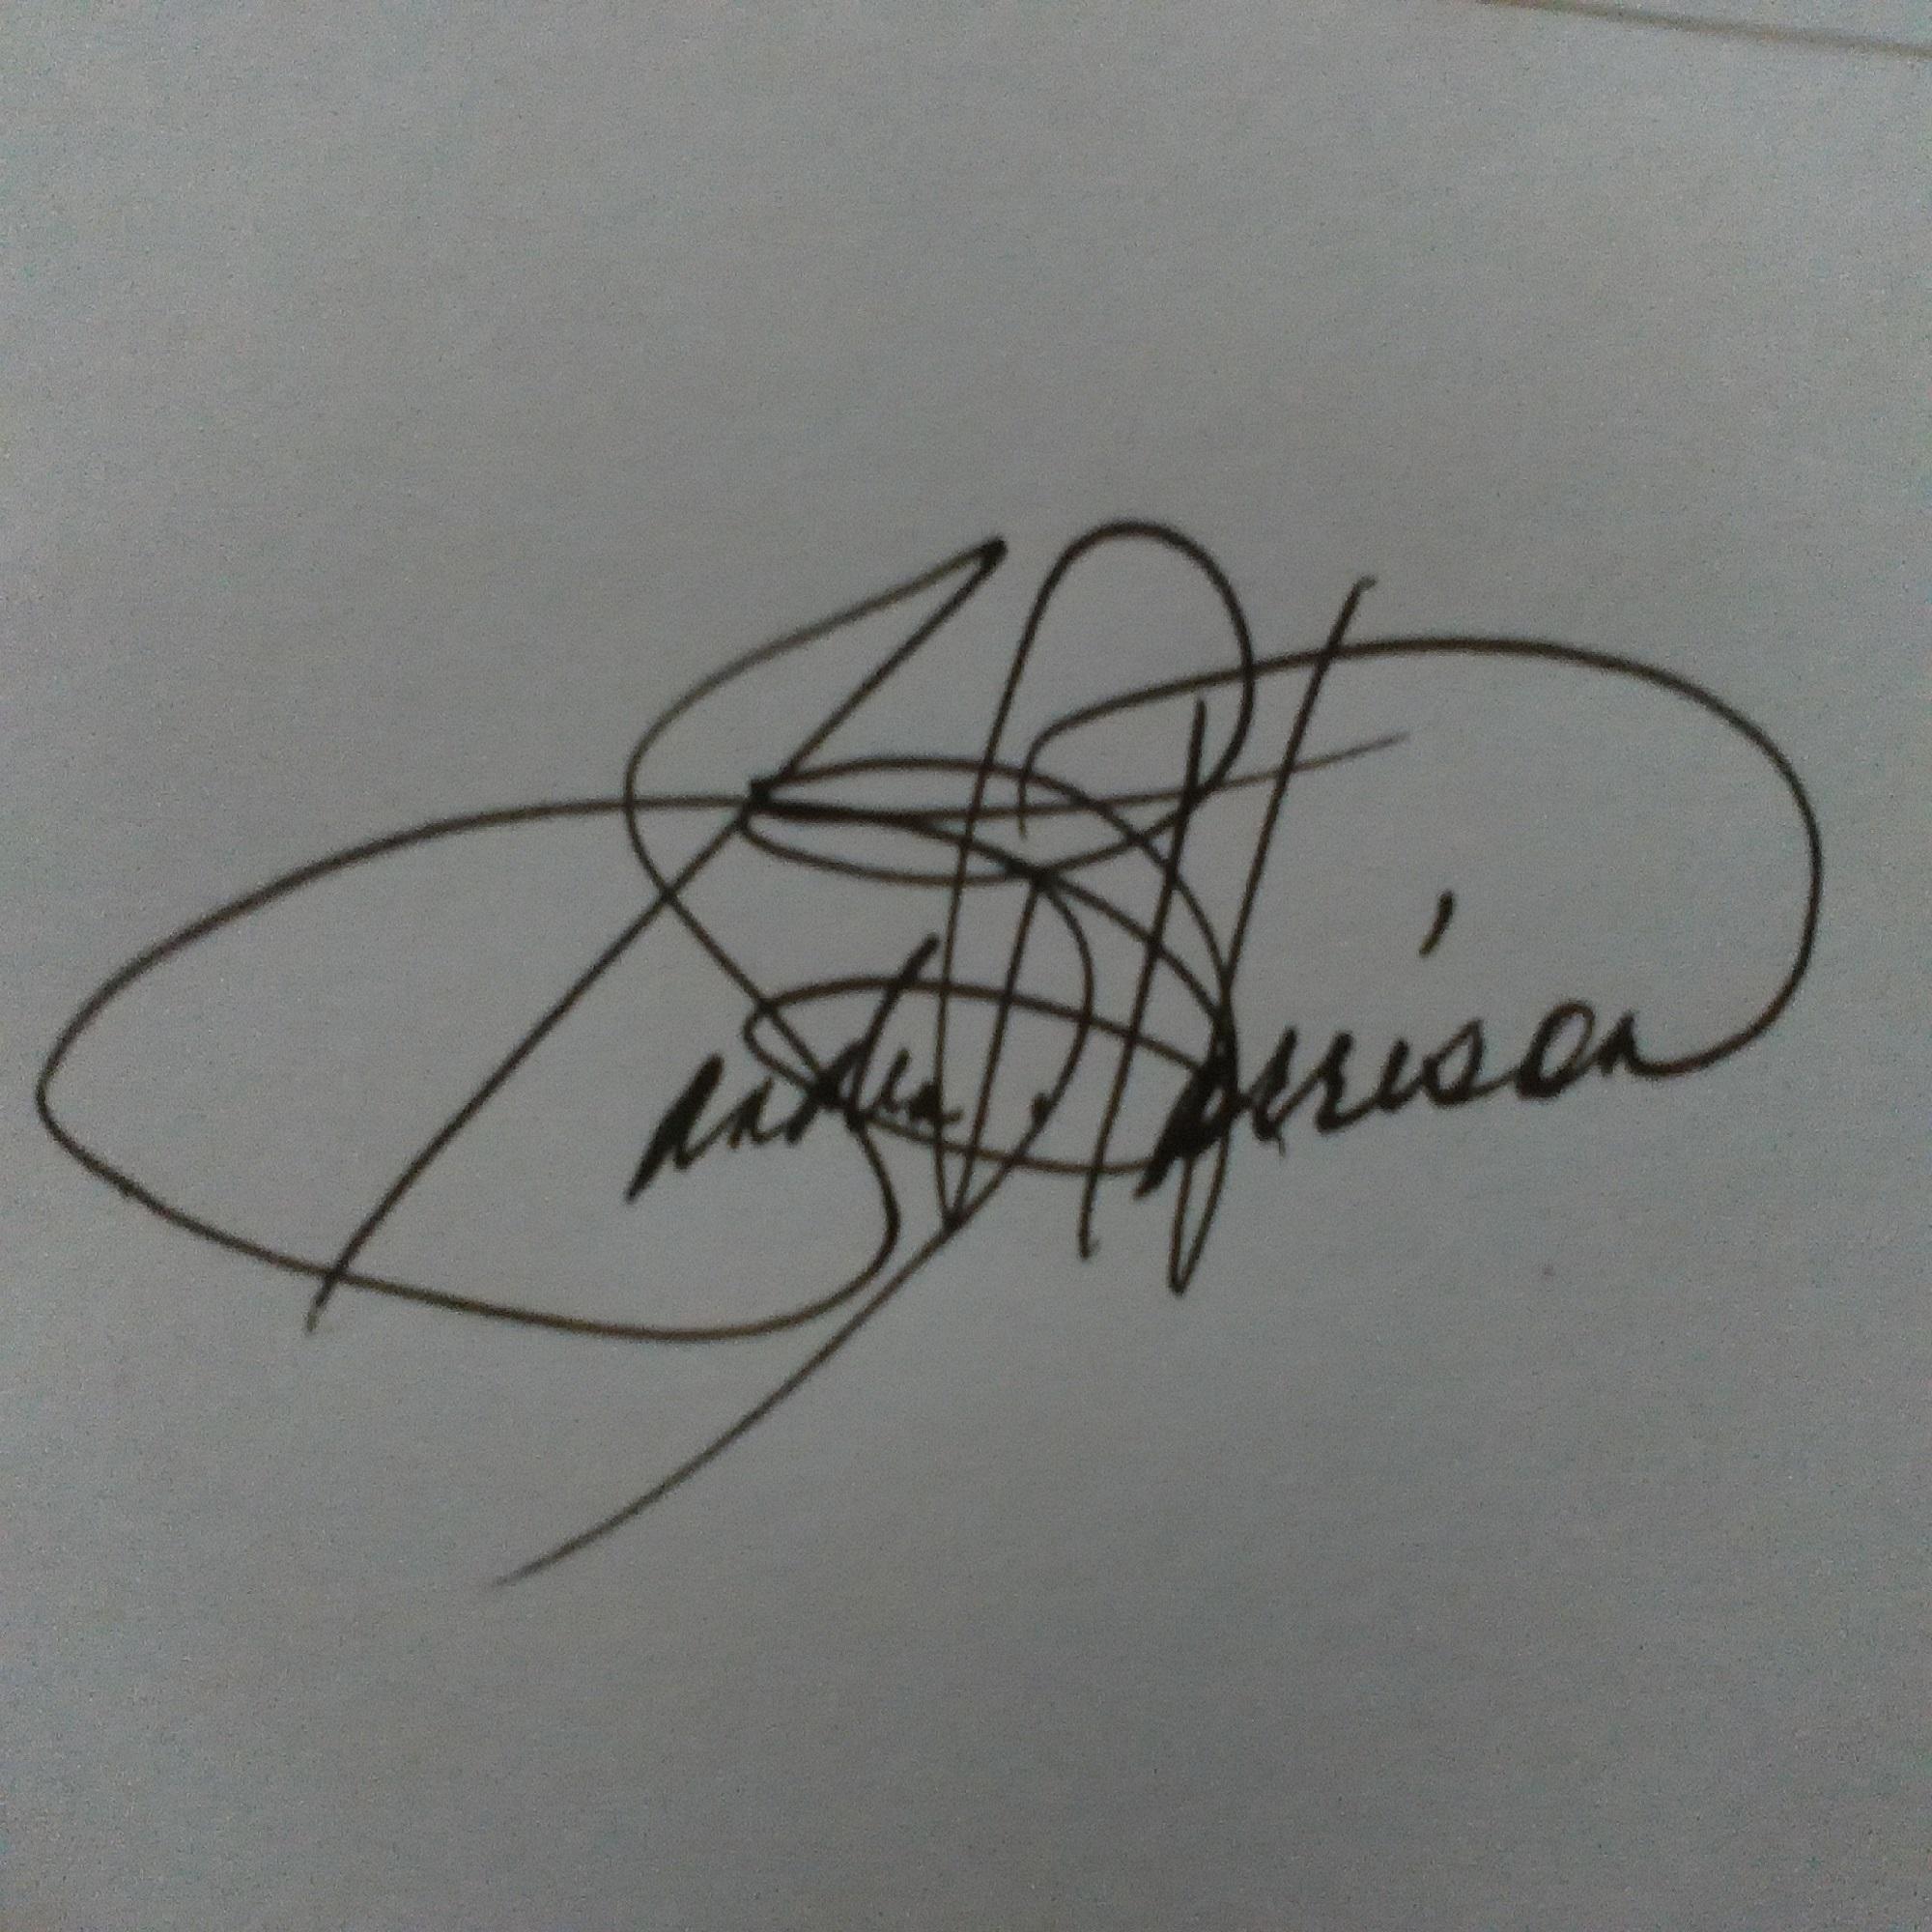 Sandra B. Harrison's Signature